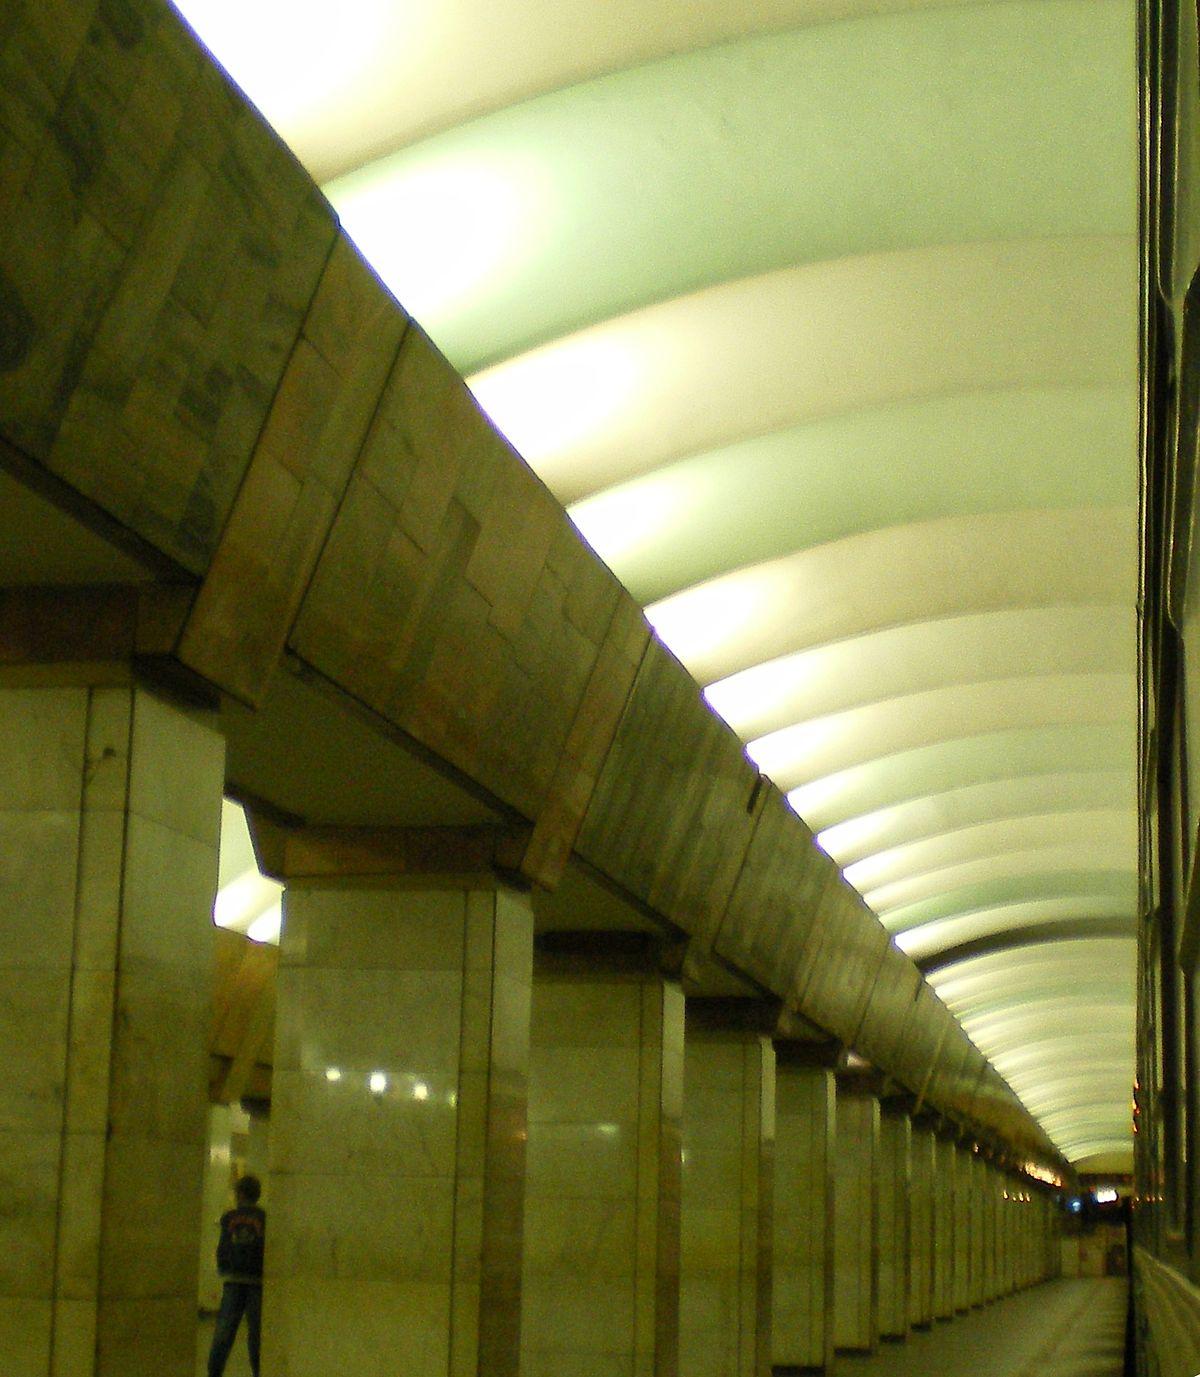 Cove lighting  Wikipedia